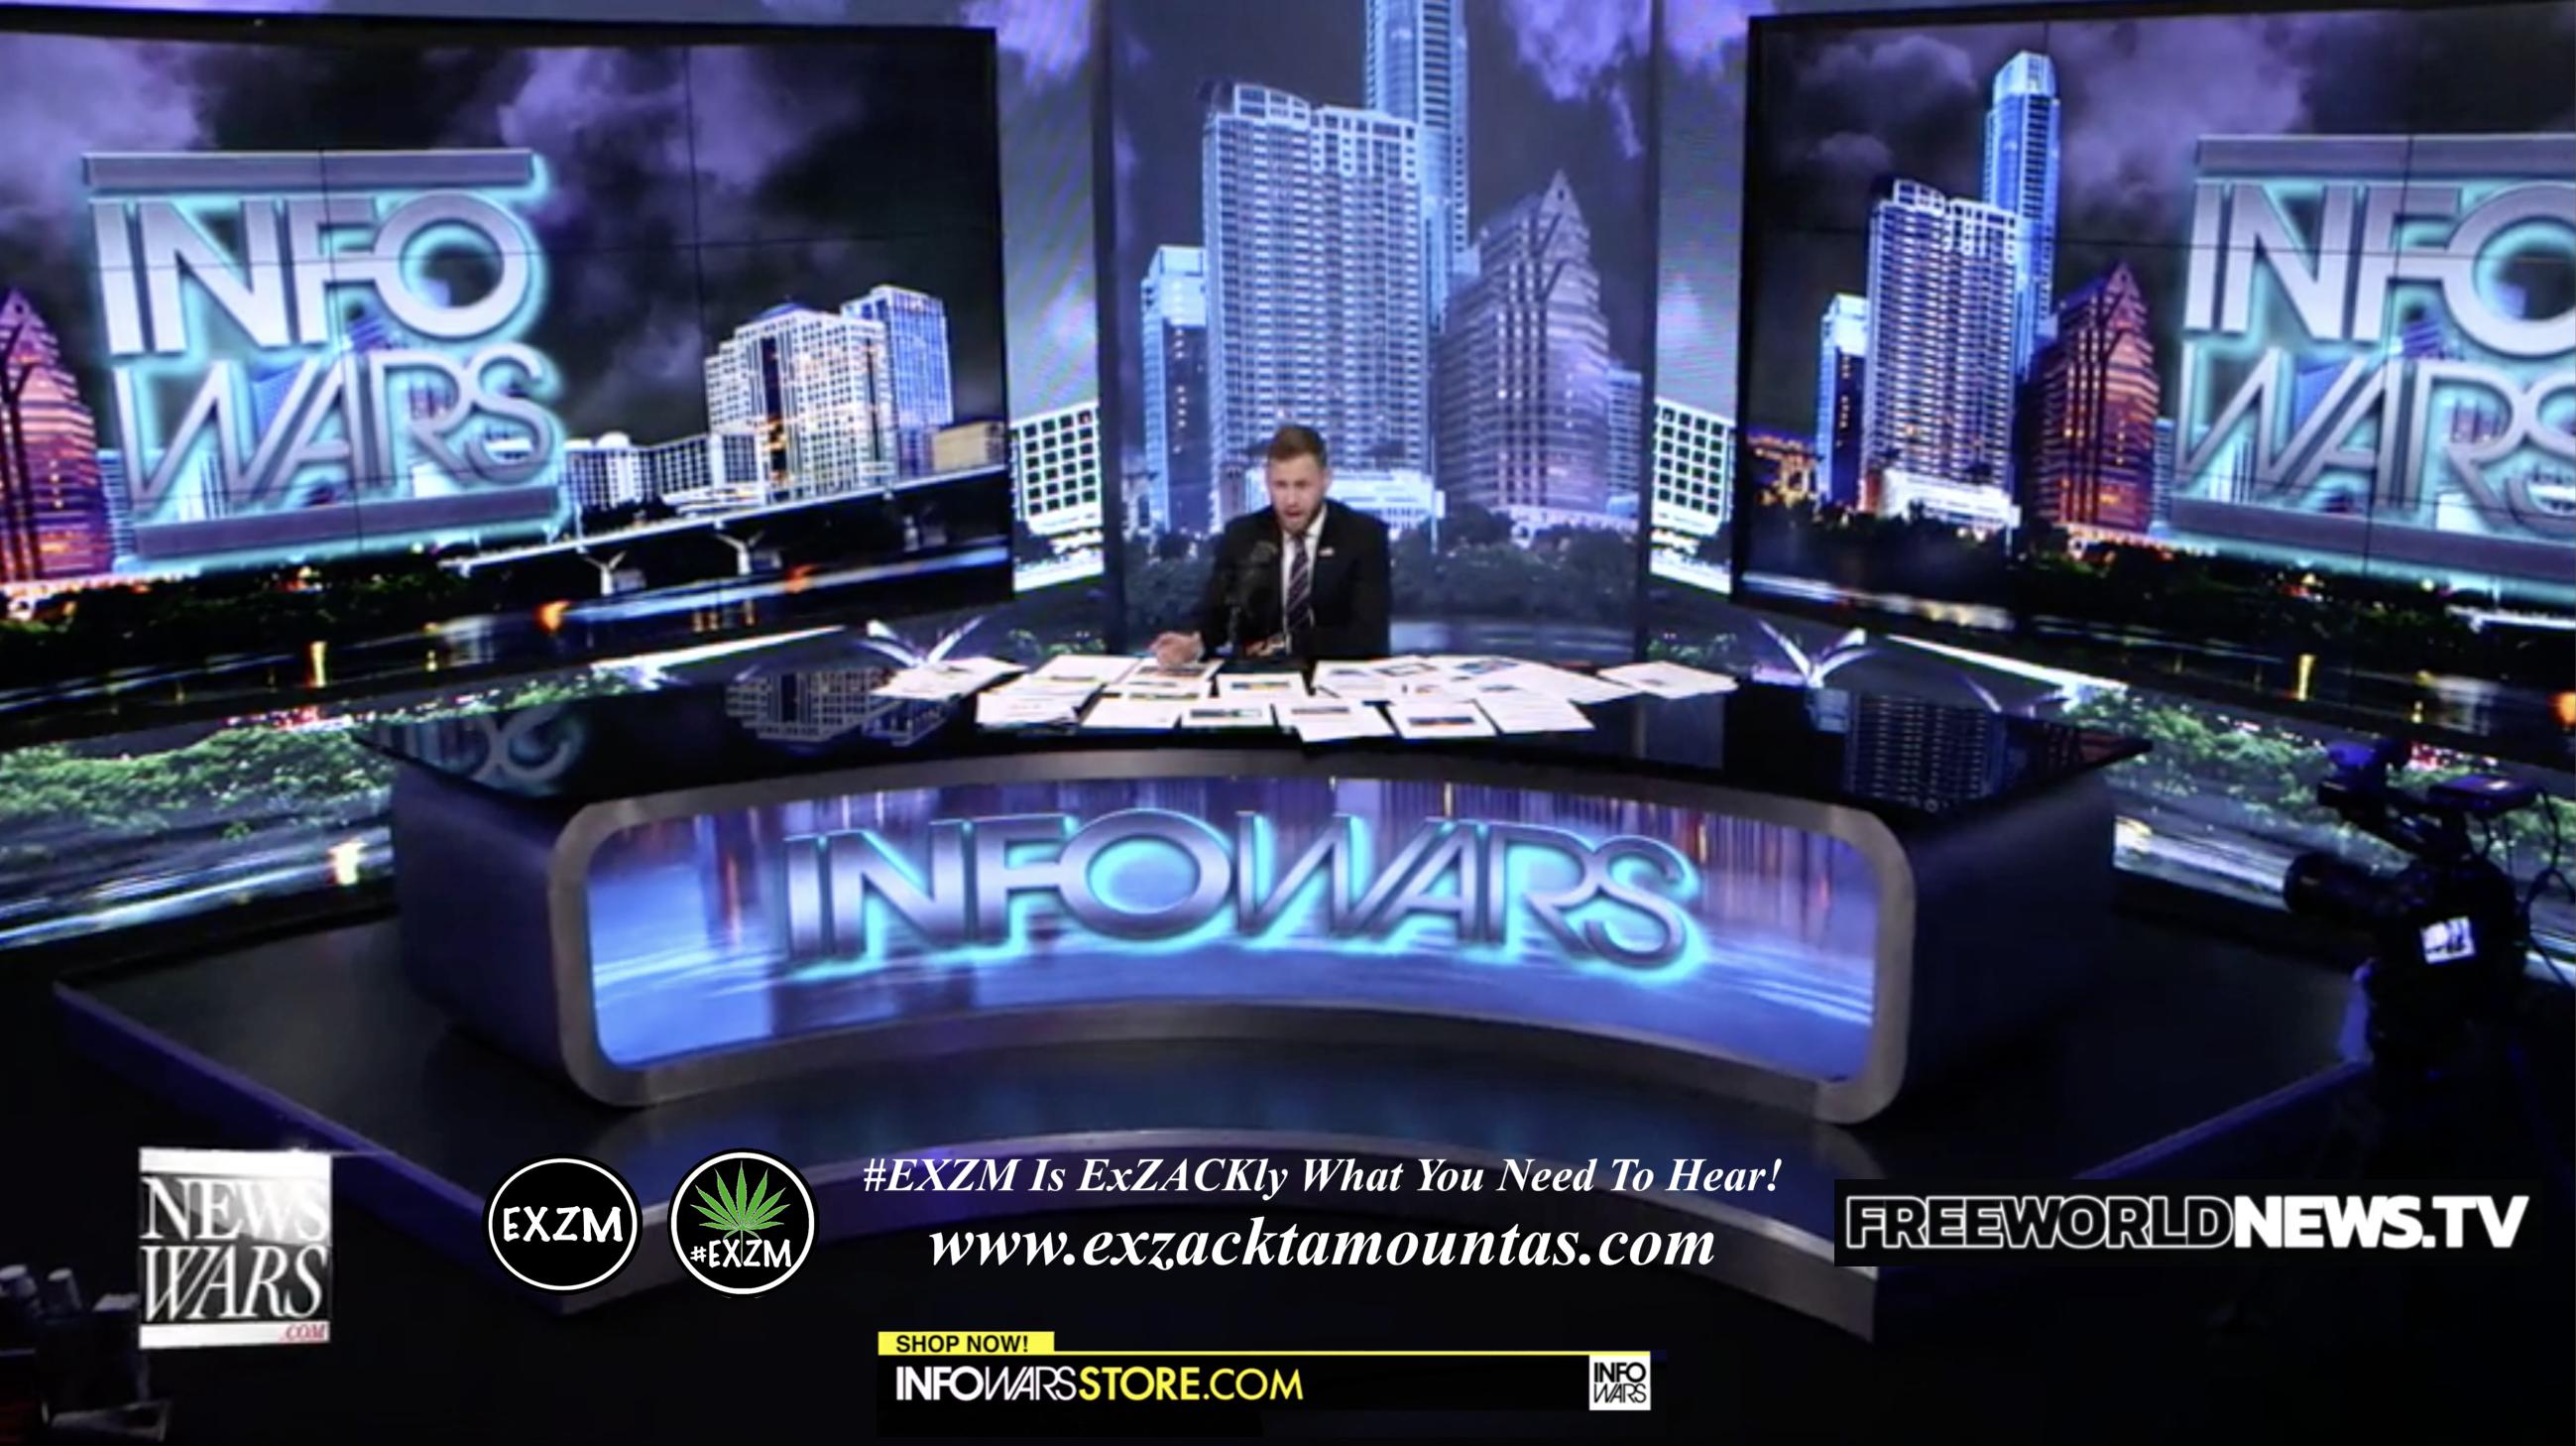 Alex Jones Owen Shroyer Live In Infowars Studio Free World News TV EXZM Zack Mount August 13th 2021 copy